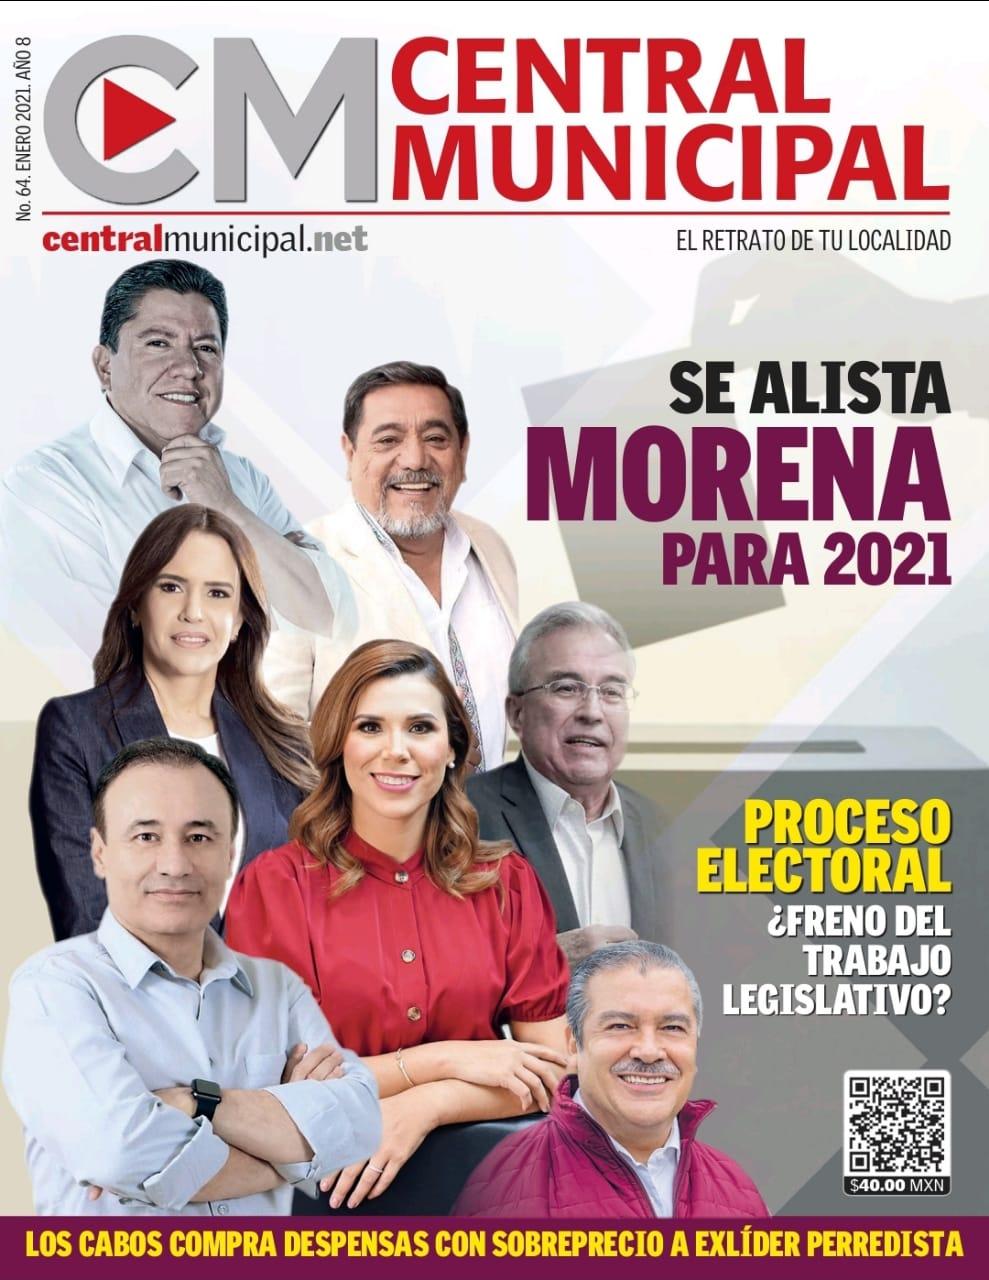 Morena 2021 Central Municipal